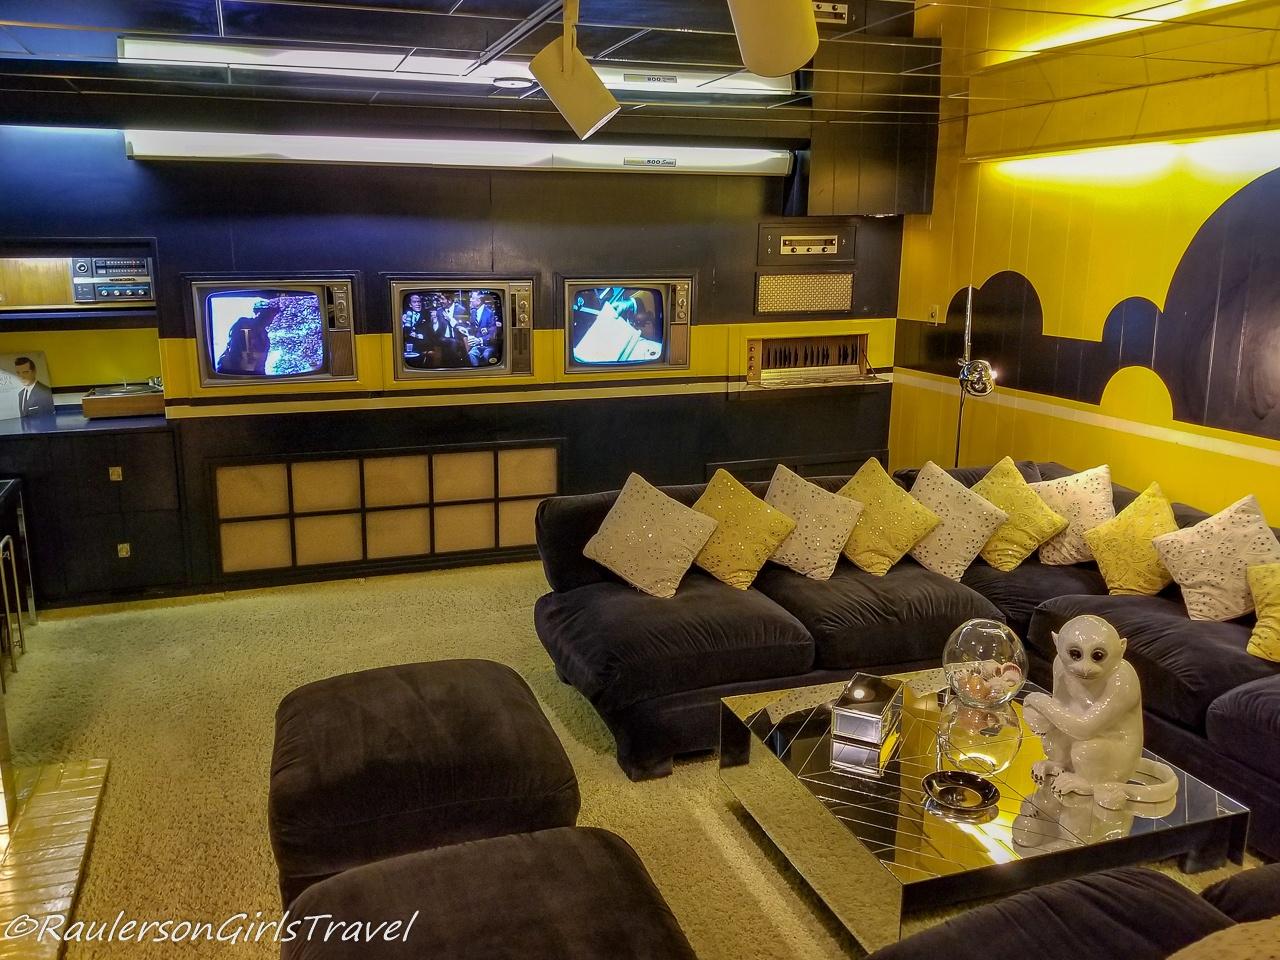 TV Room in Graceland